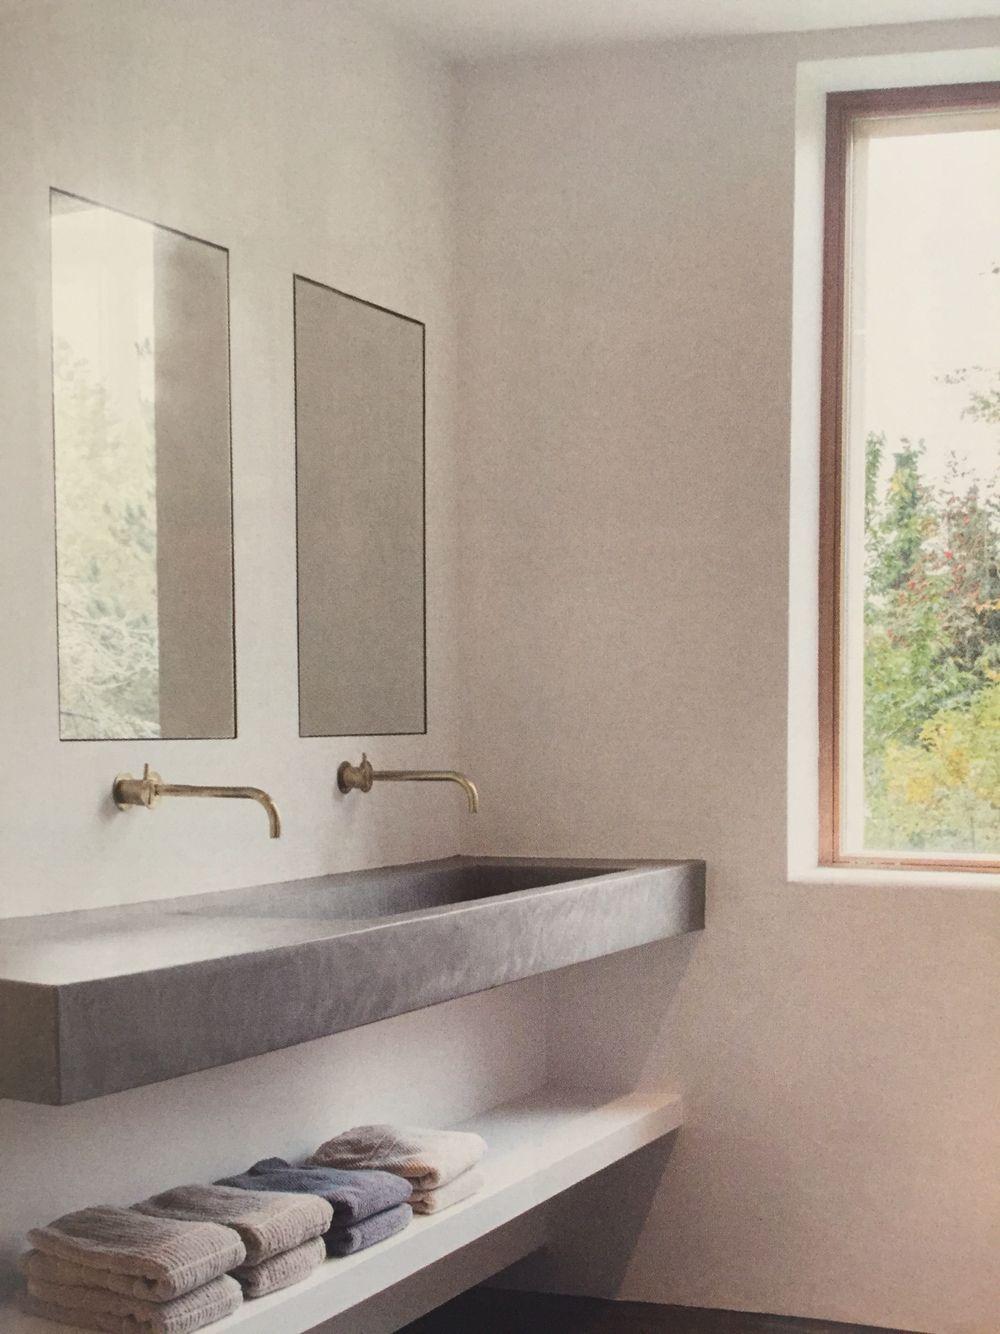 2 ingestucte spiegels boven dubbele wastafel | B A D K A M E R ...